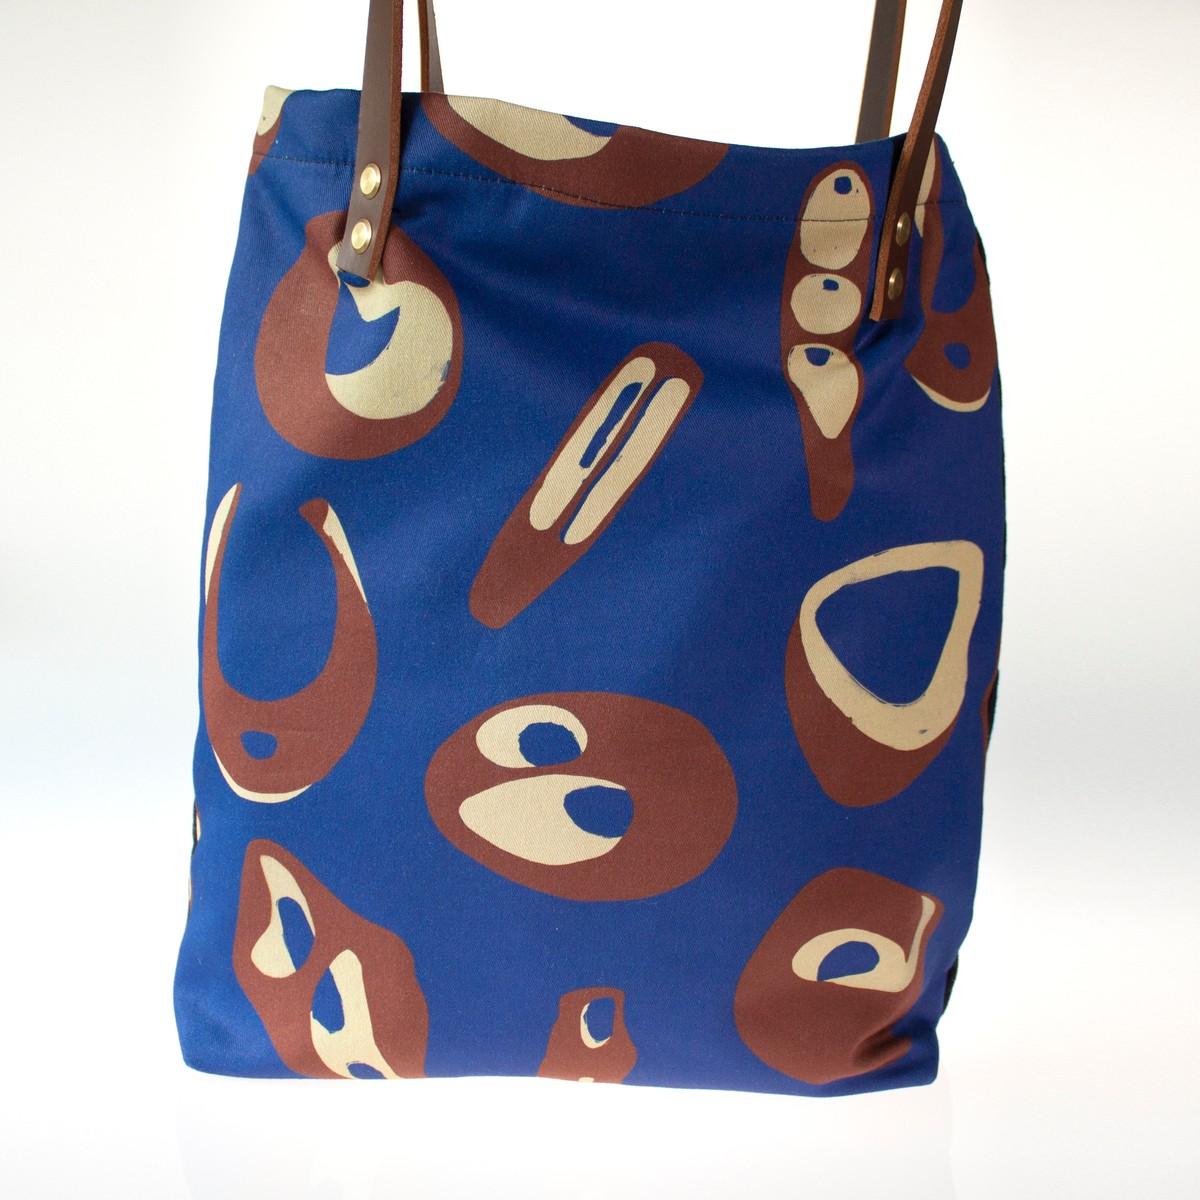 Photo of Hepworth Tote Bag in Colbalt Blue